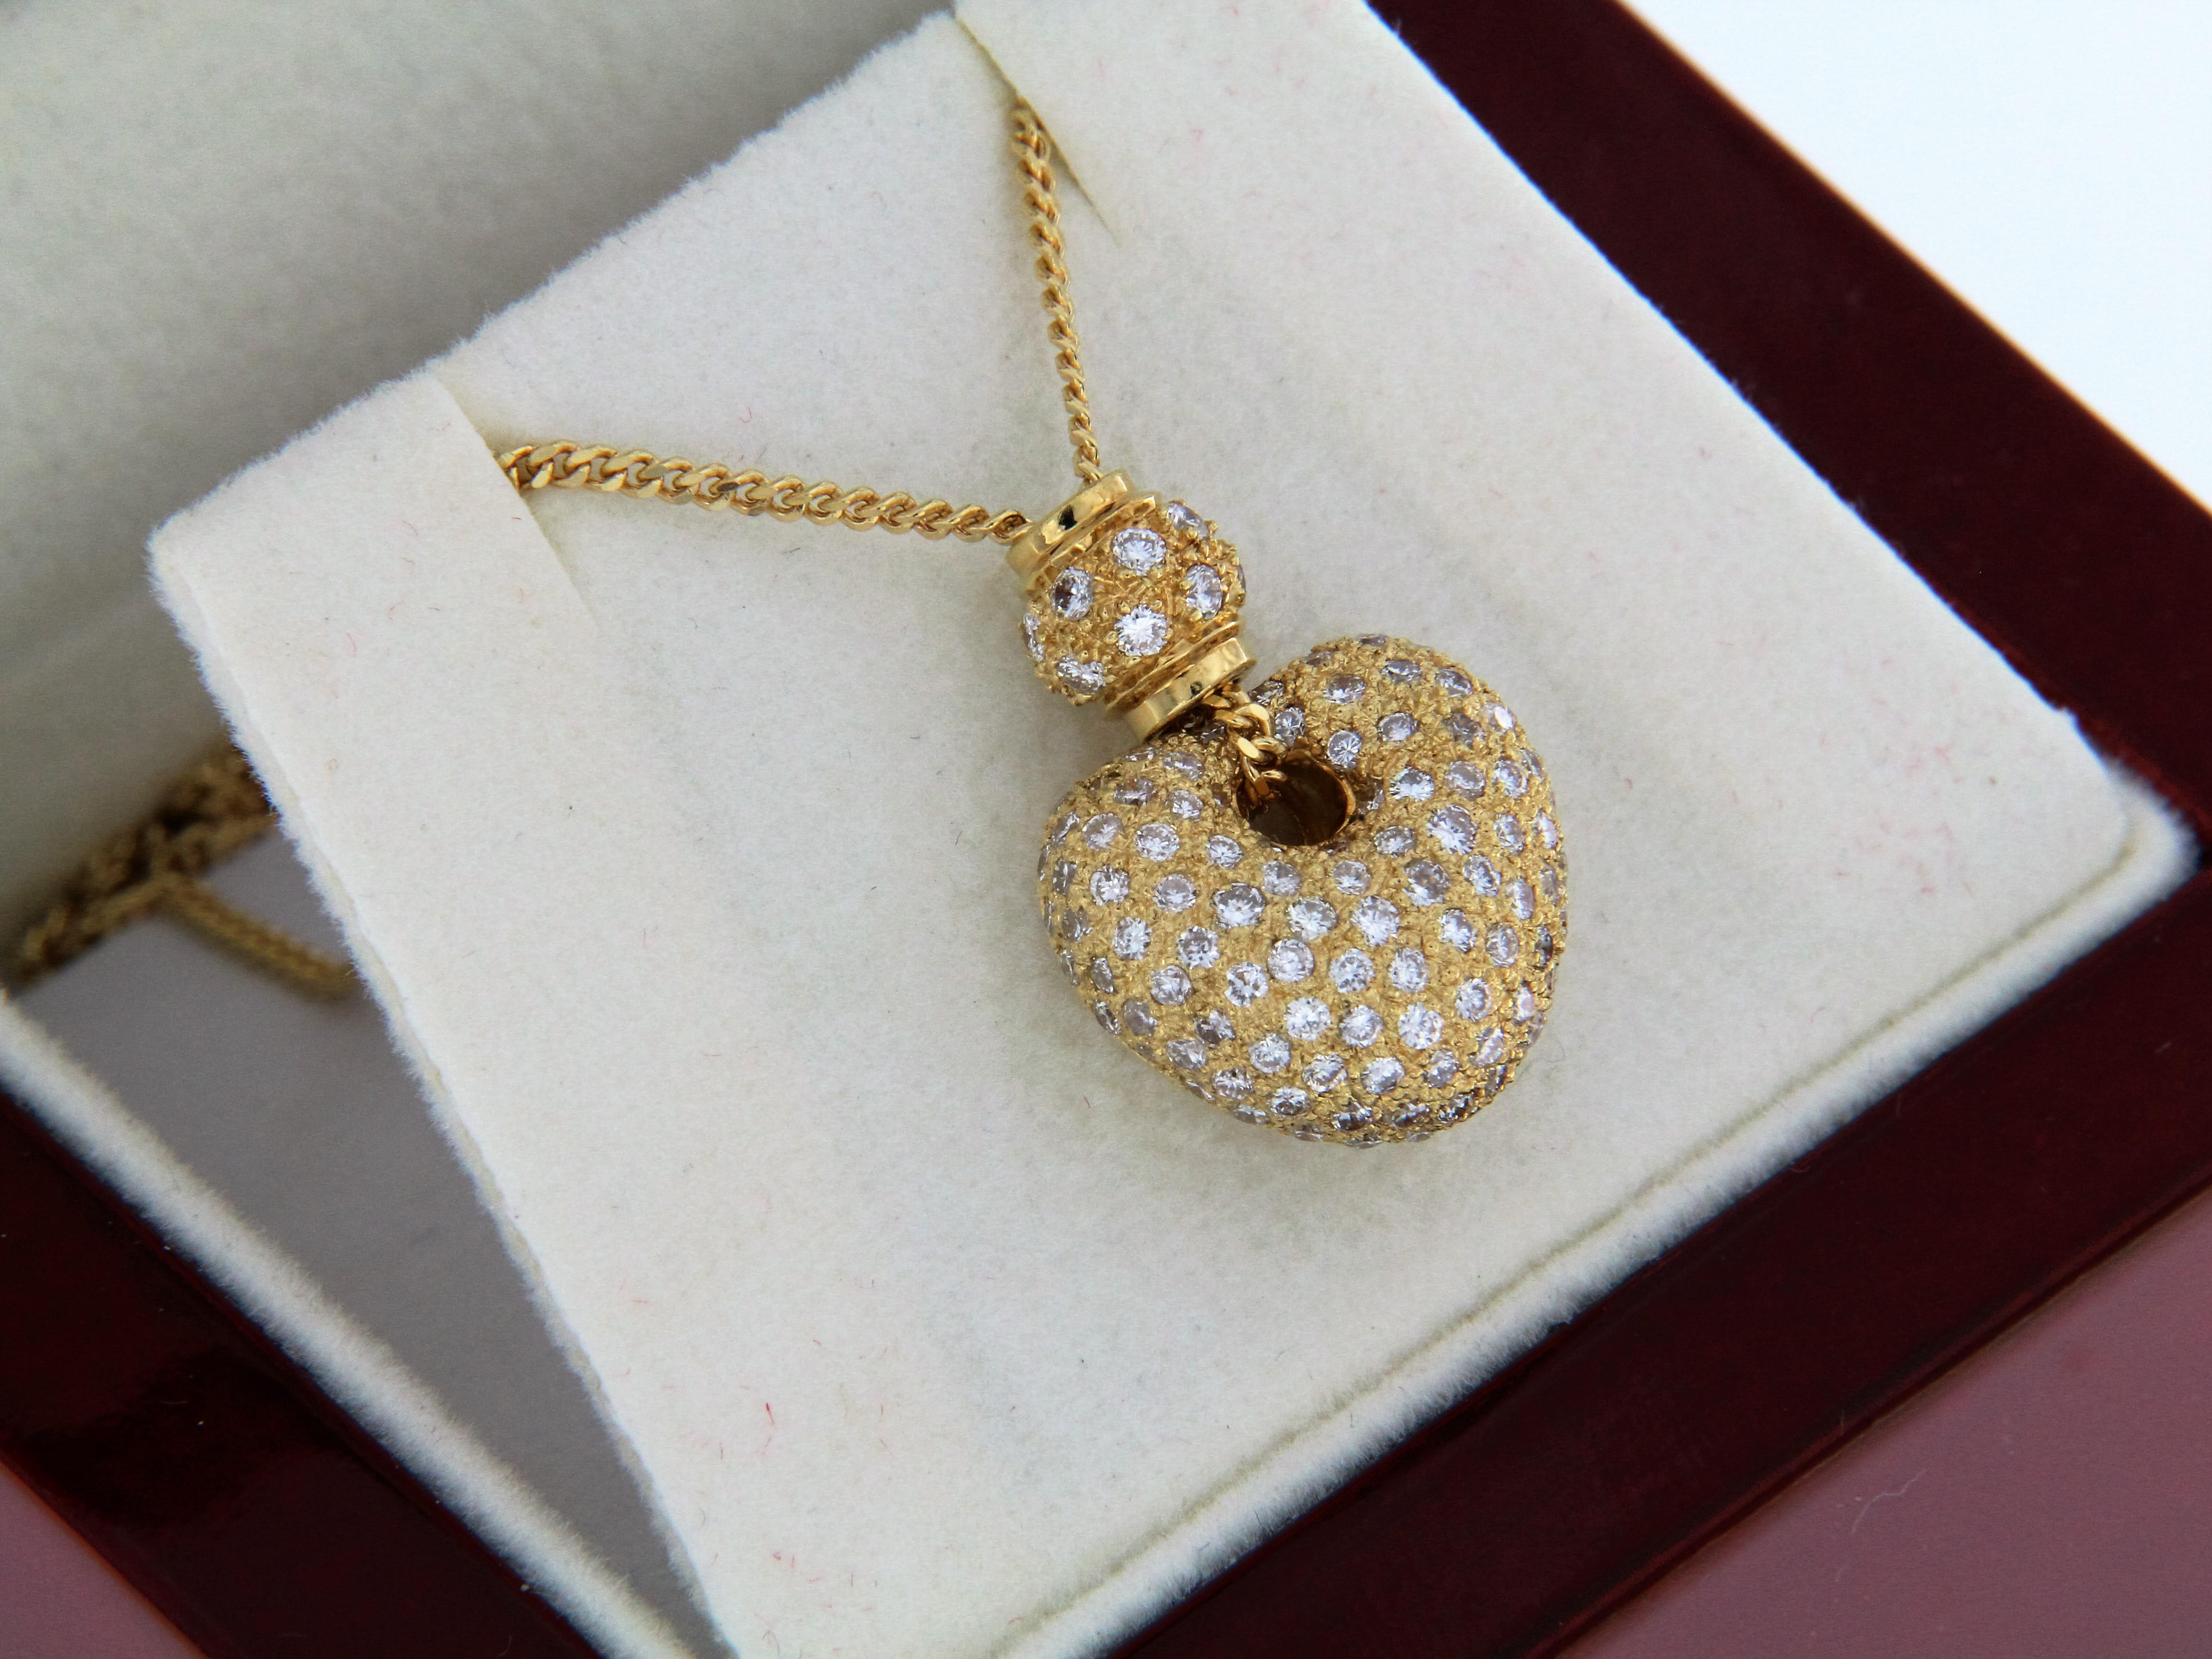 collier pendentif coeur or 18 carats et diamants. Black Bedroom Furniture Sets. Home Design Ideas